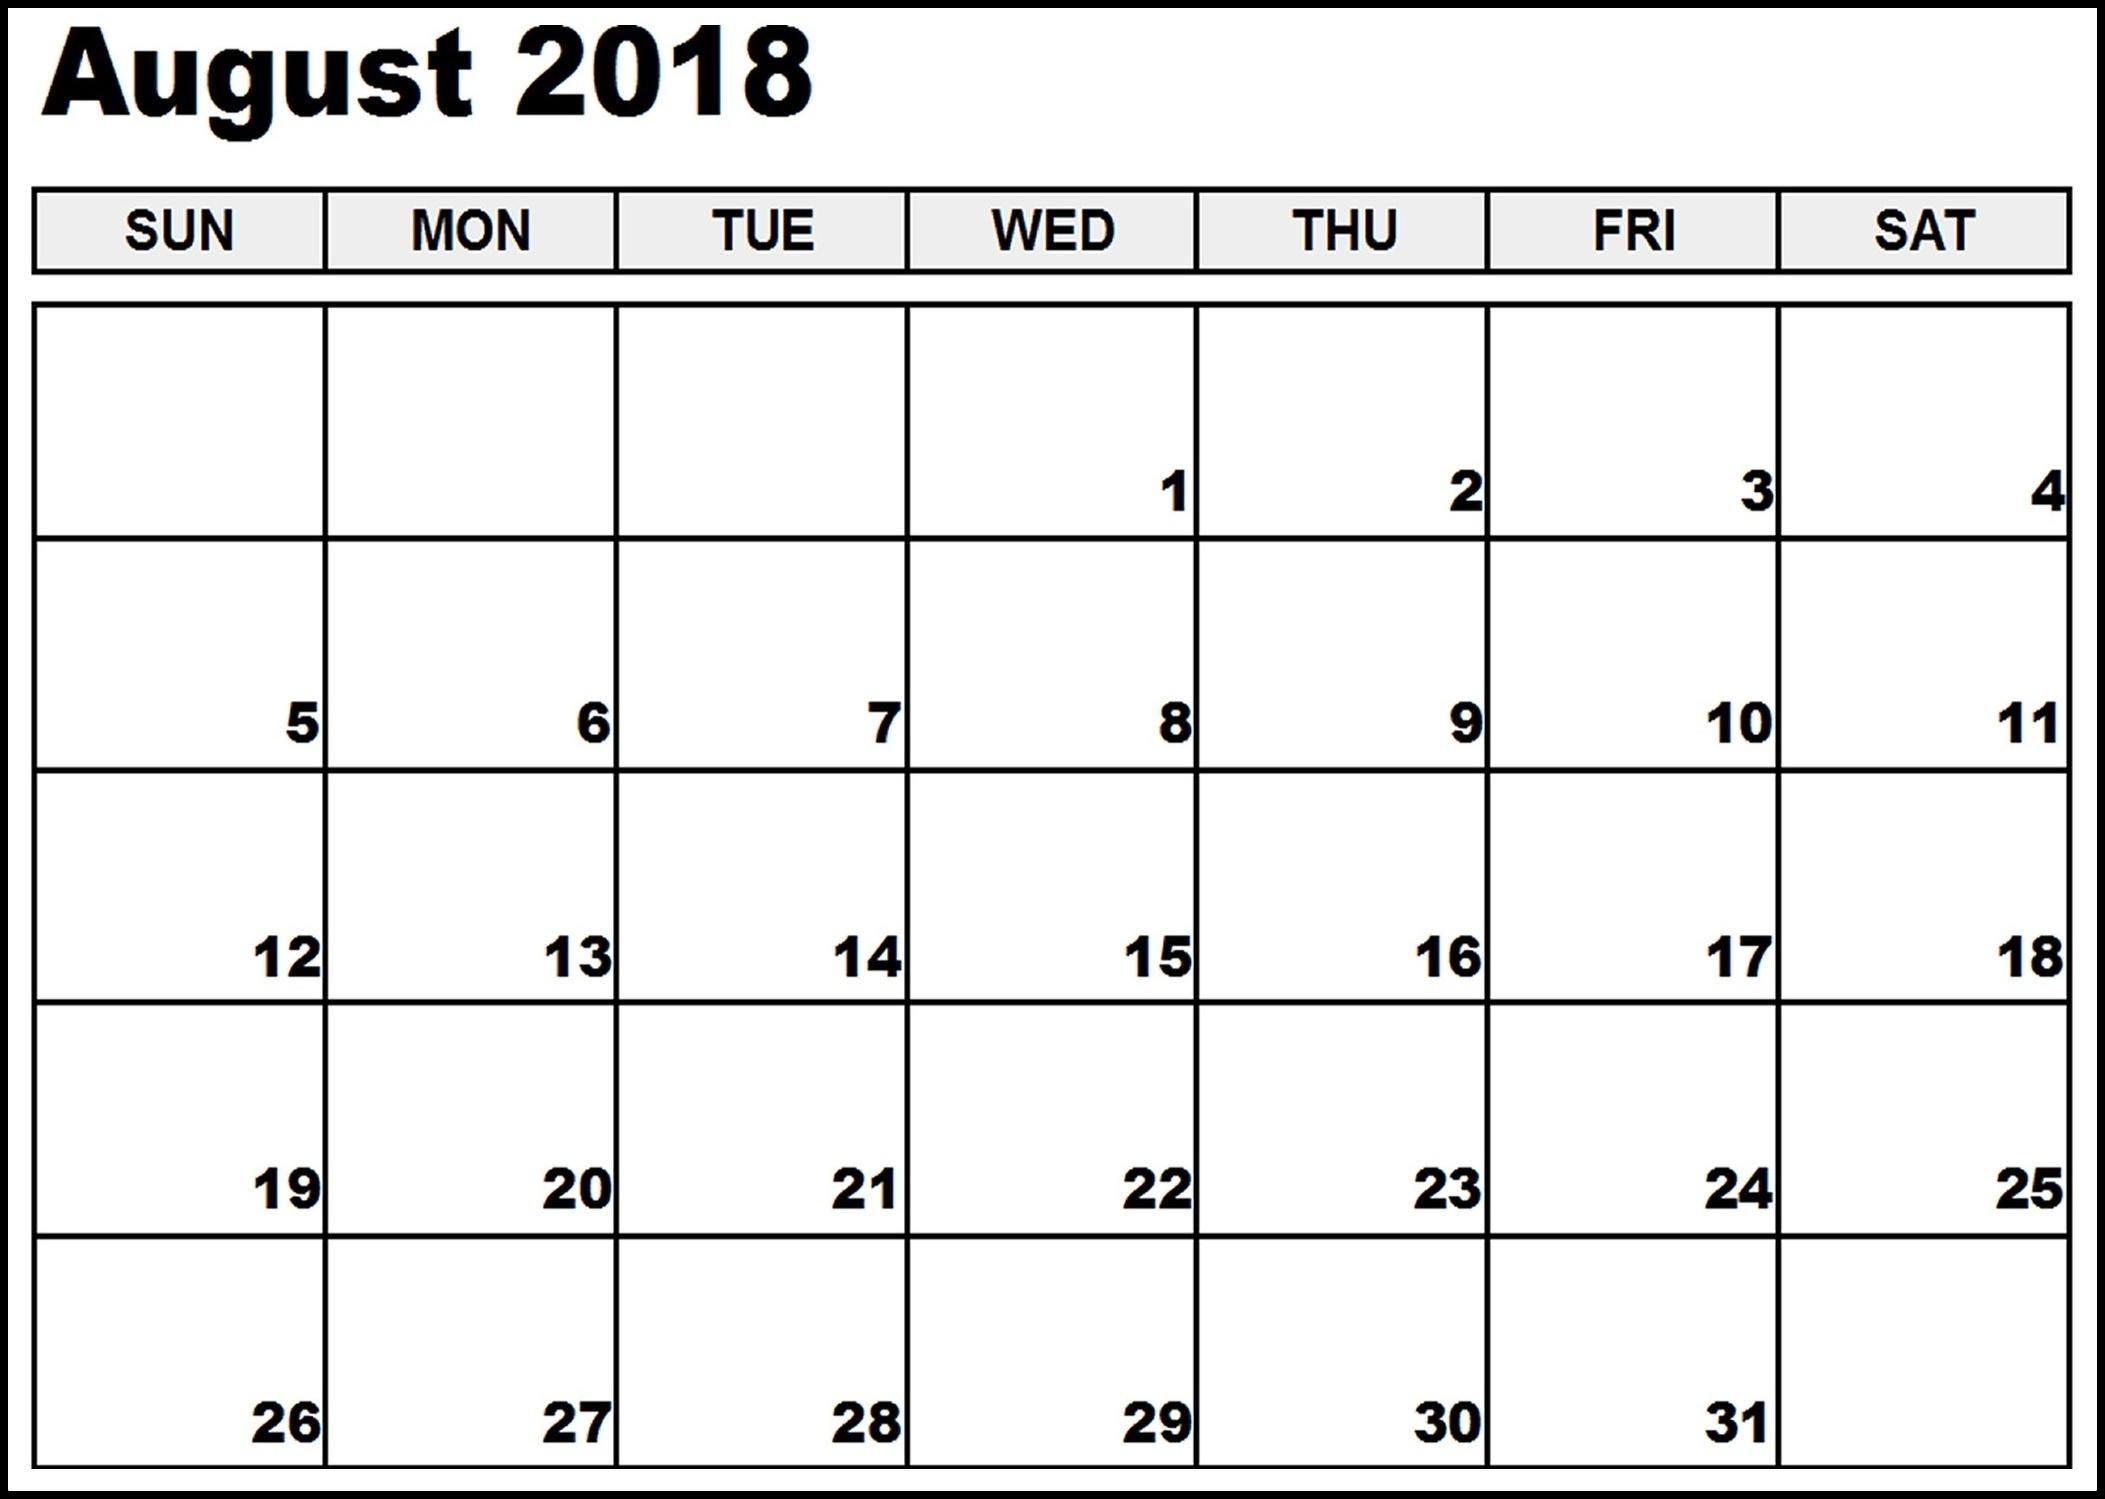 printable calendar august 2018 free calendar templates Calendar August 2018 Printable Free erdferdf